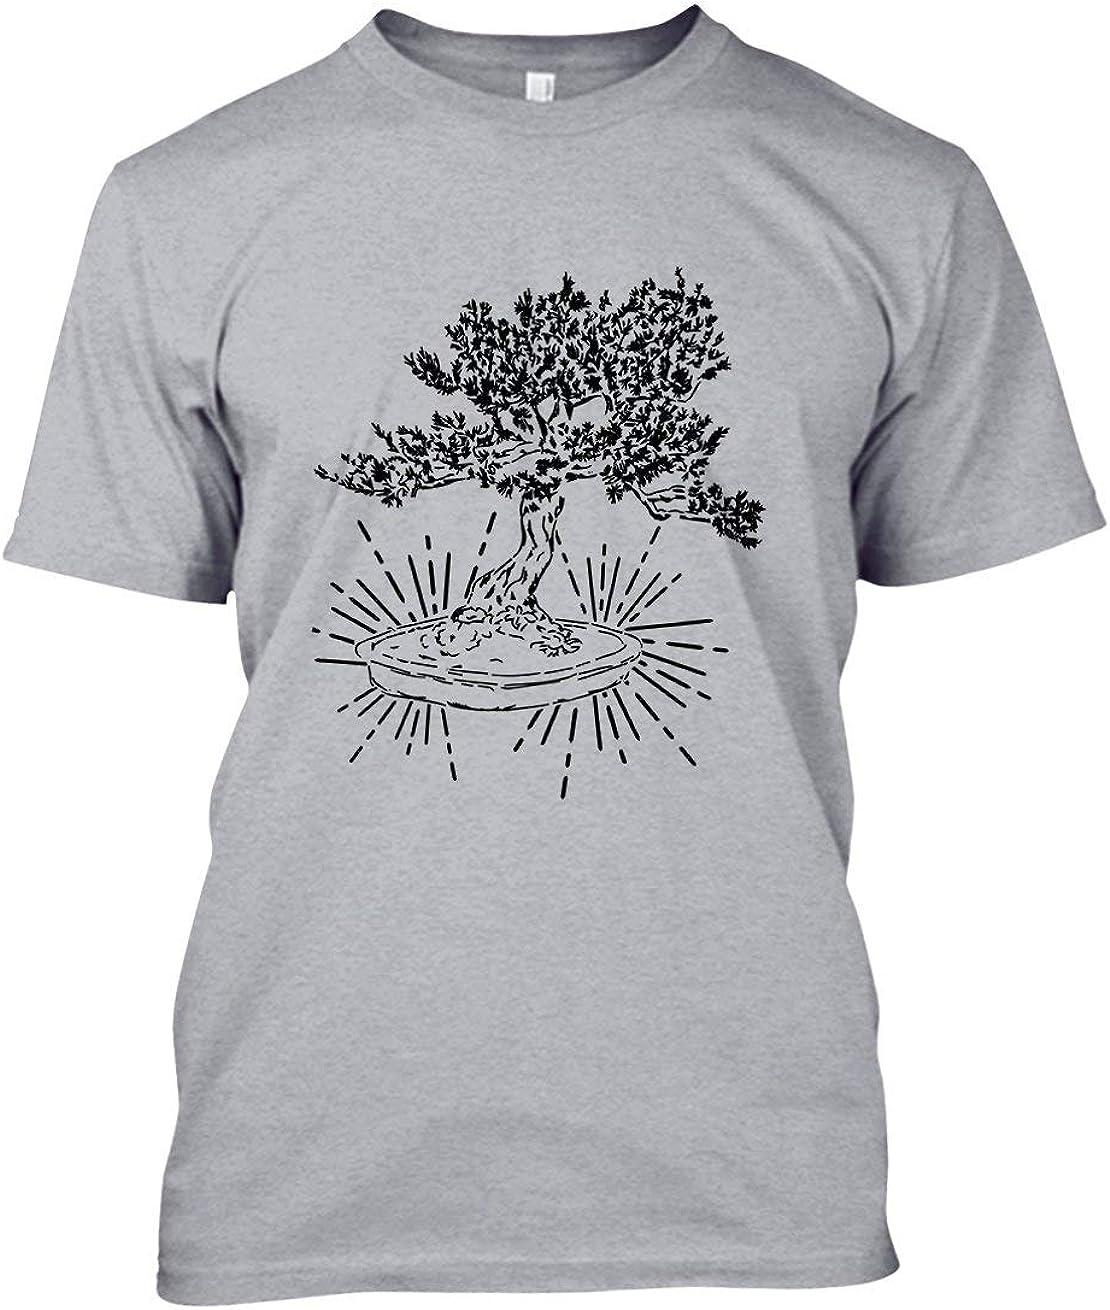 Amazon Com See Black Bonsai Tree Mens Shirt T Shirts Gift For Women Clothing